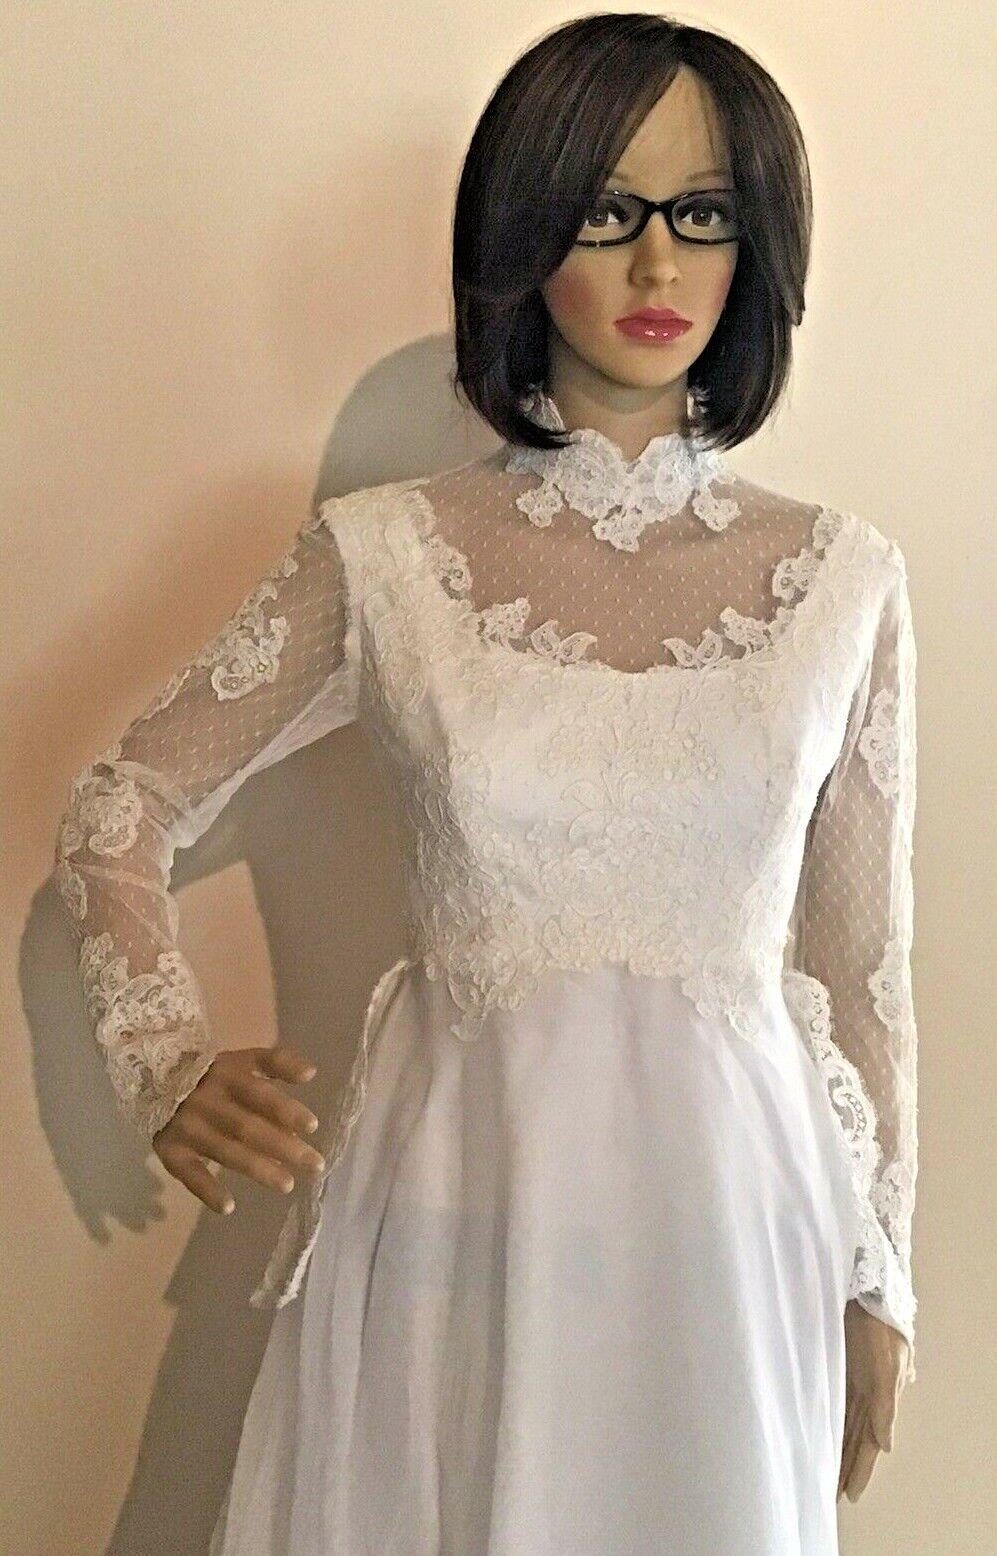 White Wedding Dress~ Lots of lace~Fitted Waistline~Long sleeve~Peplum~Train EUC